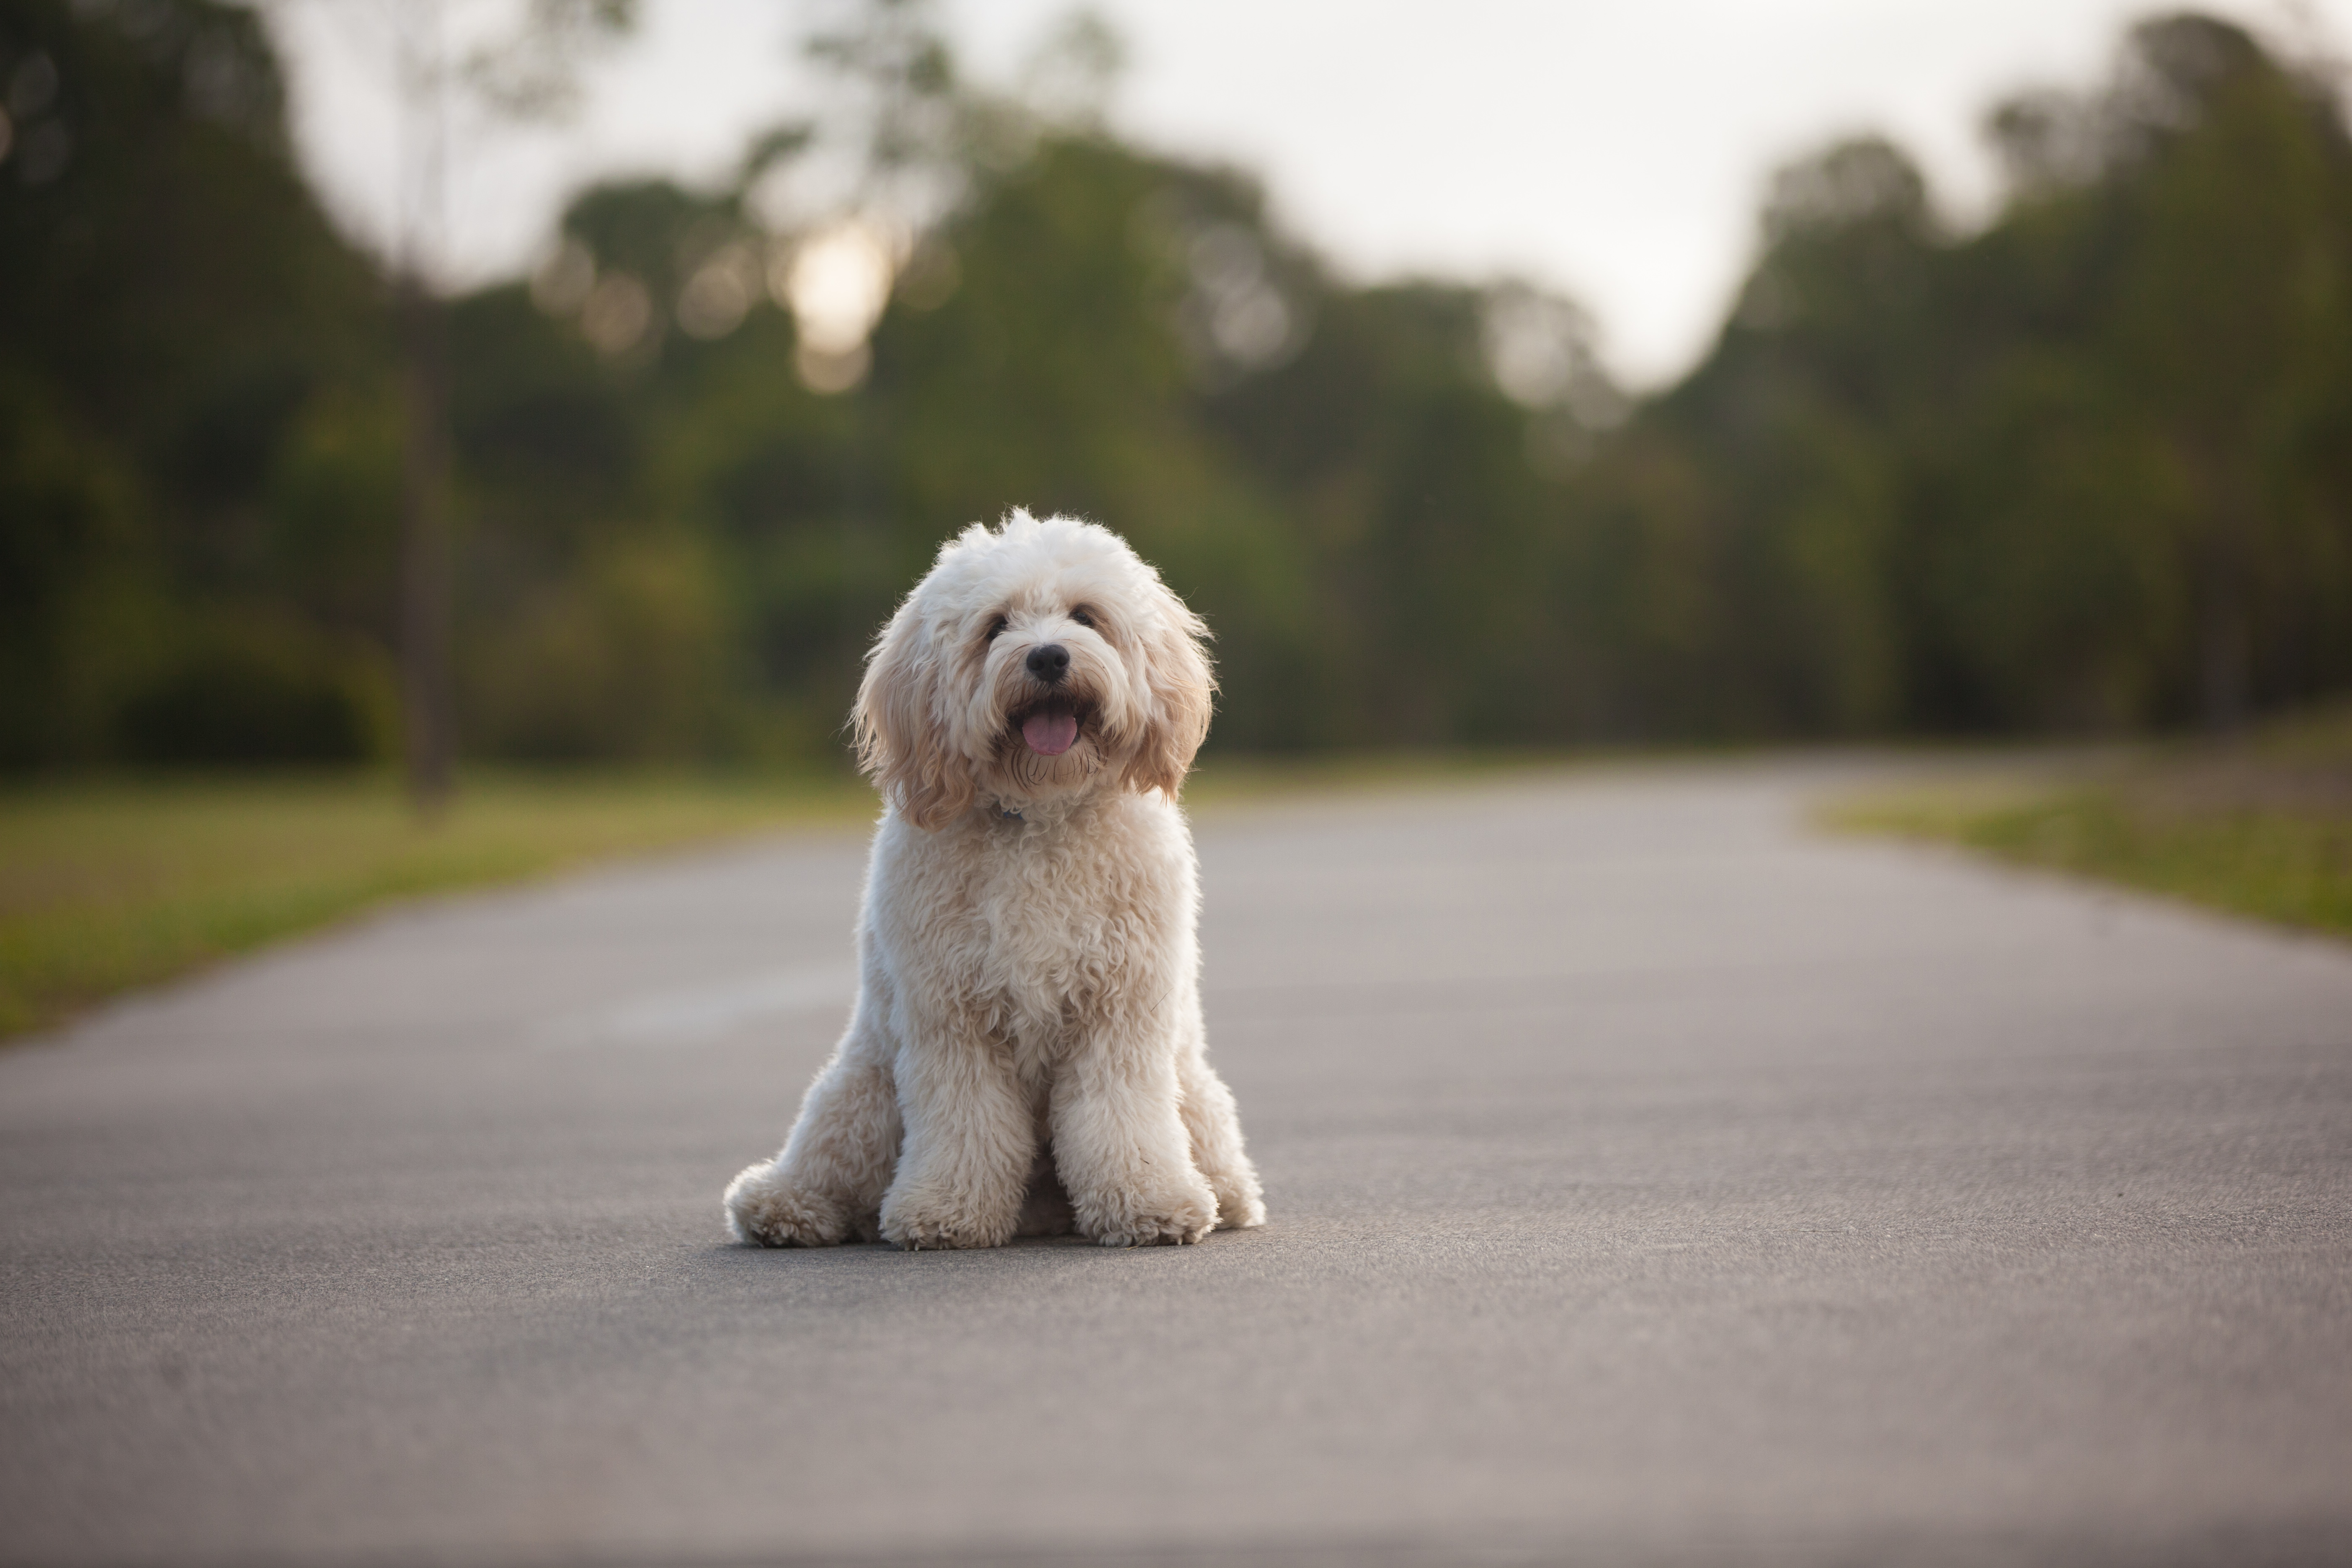 chermside pet photoshoot